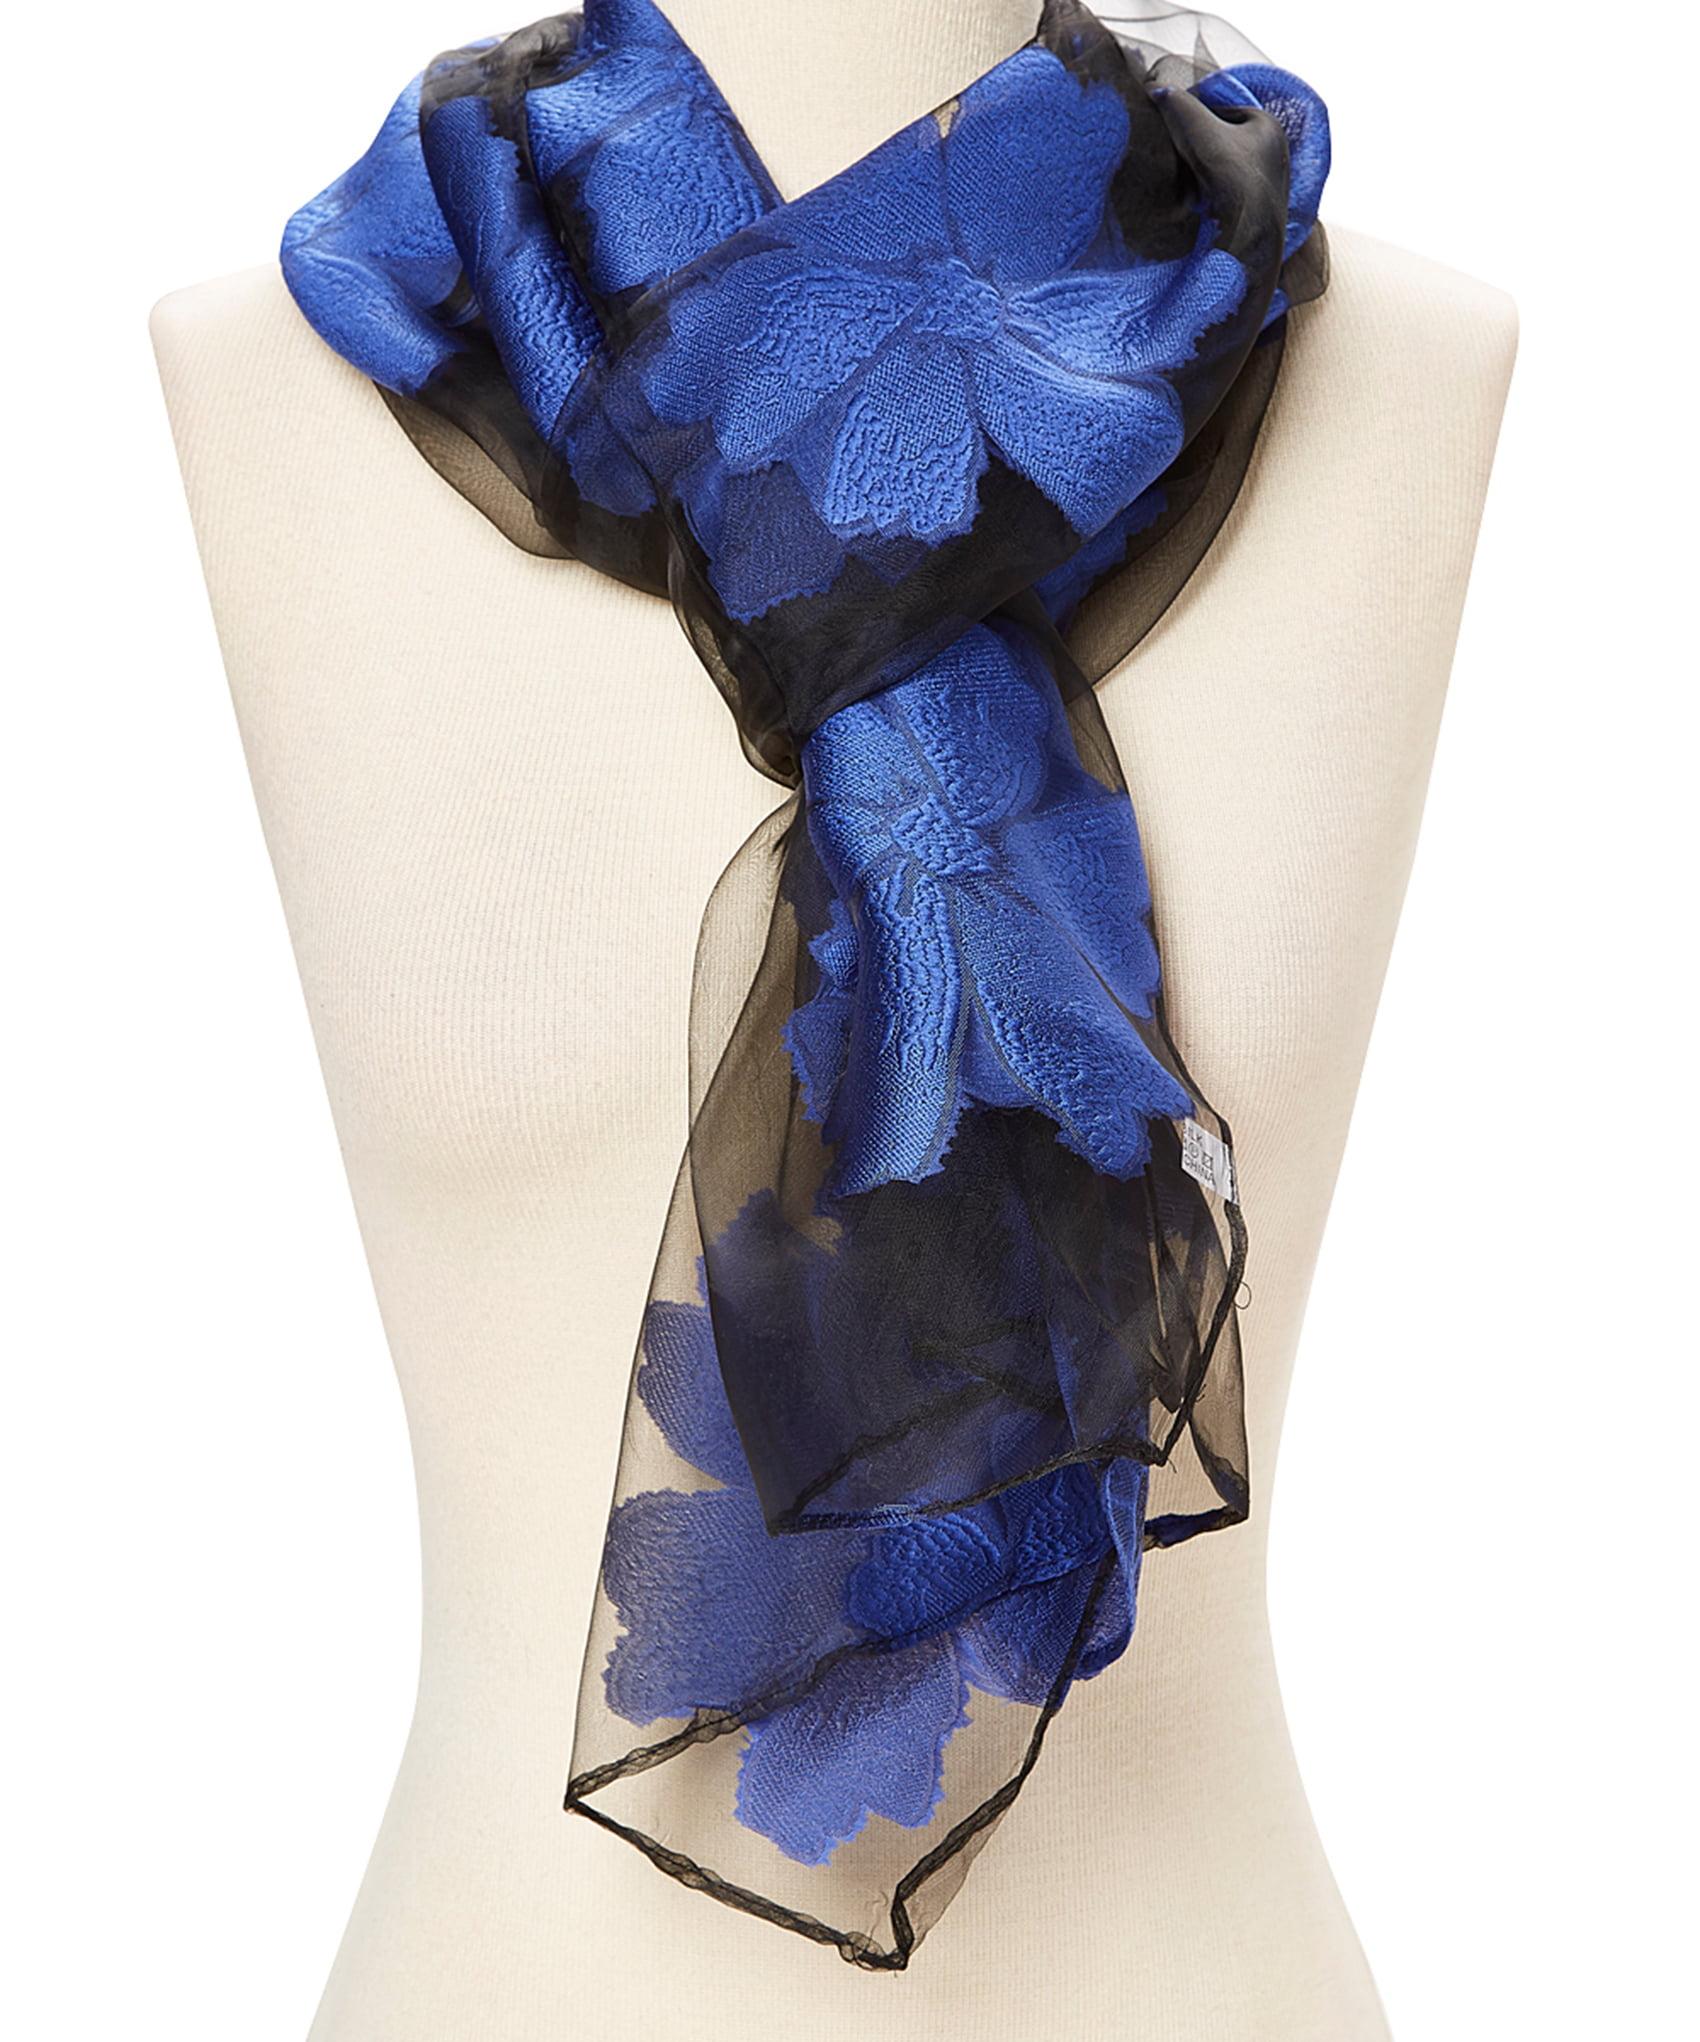 New Hot Women/'s Silk Wrap Shawl Ladies Charm Neckerchief Smooth Neck Scarves